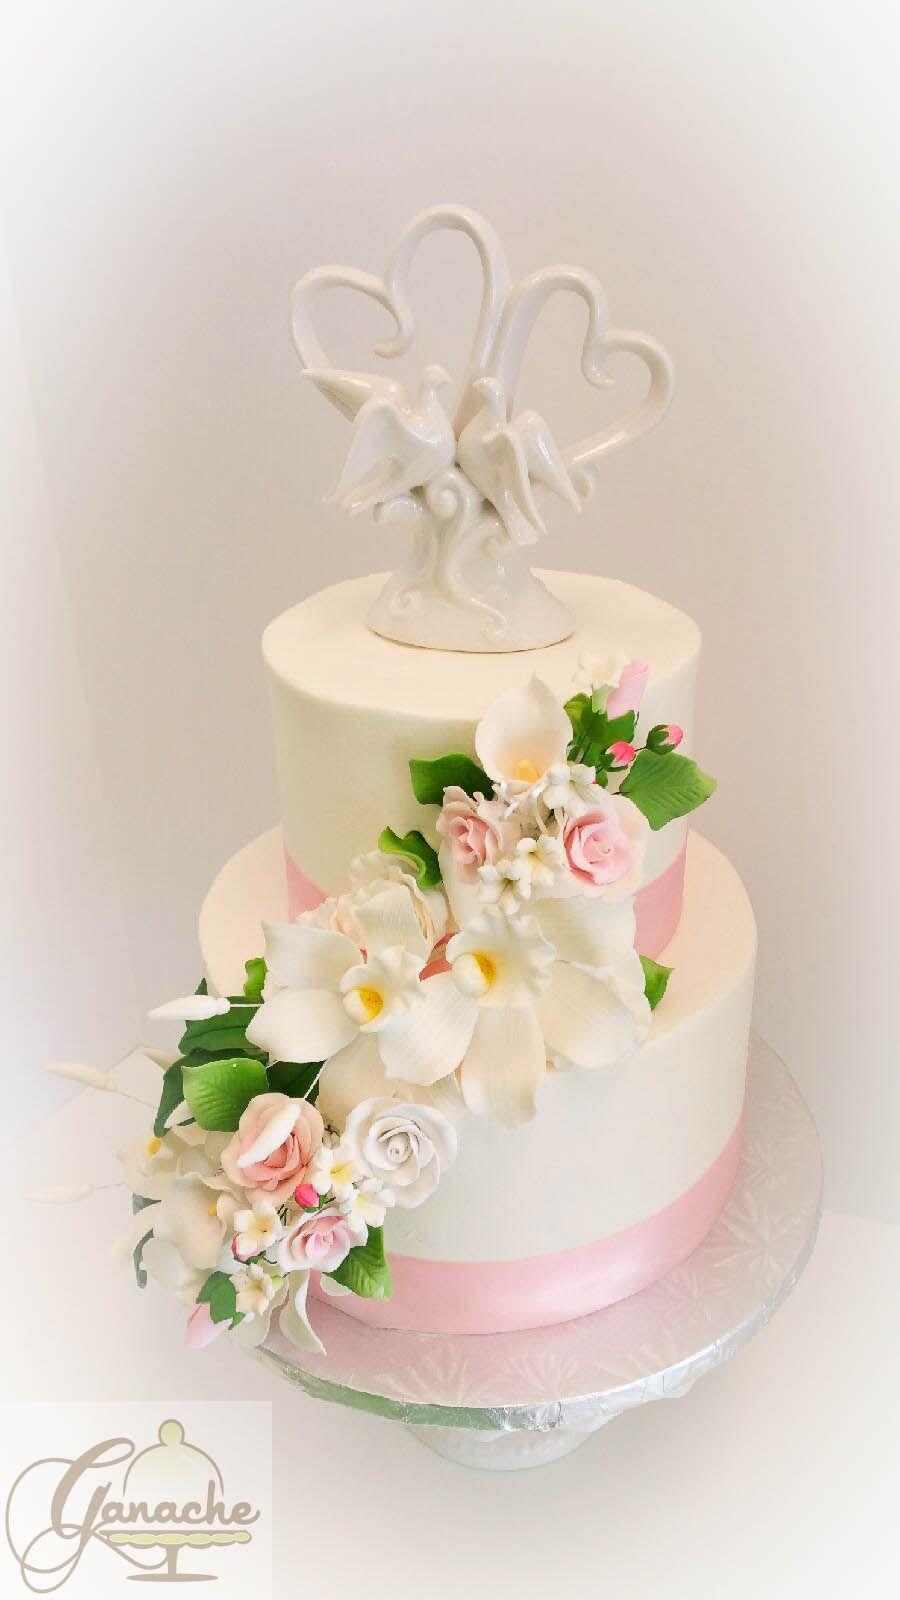 Simple But Elegant Wedding Cake Our Wedding Cakes Pinterest